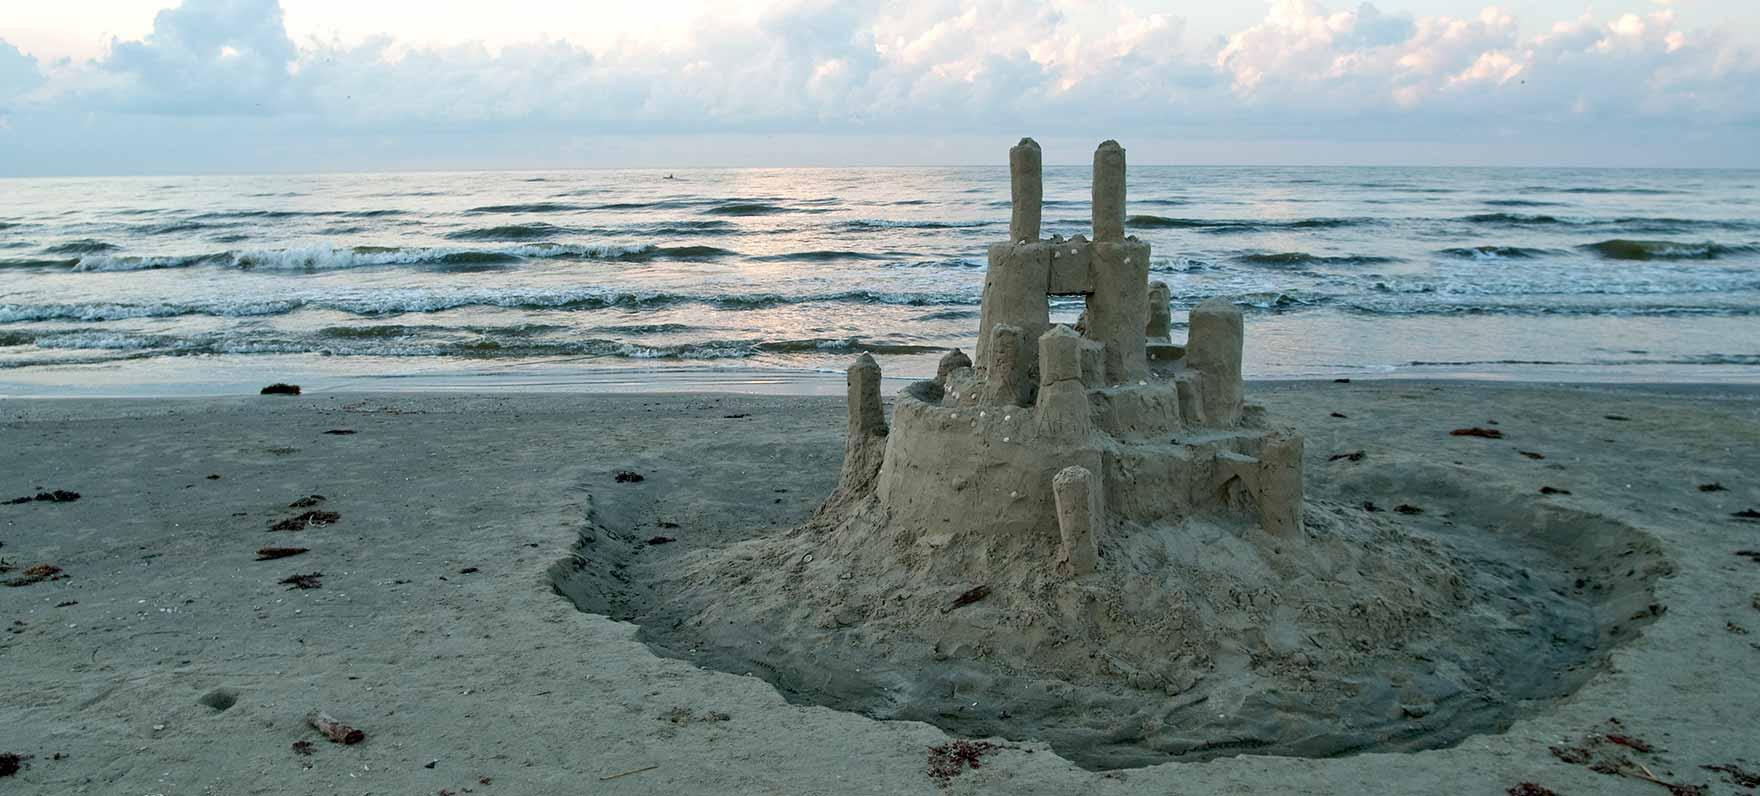 Sandcastle on beach at Galveston Island State Park.